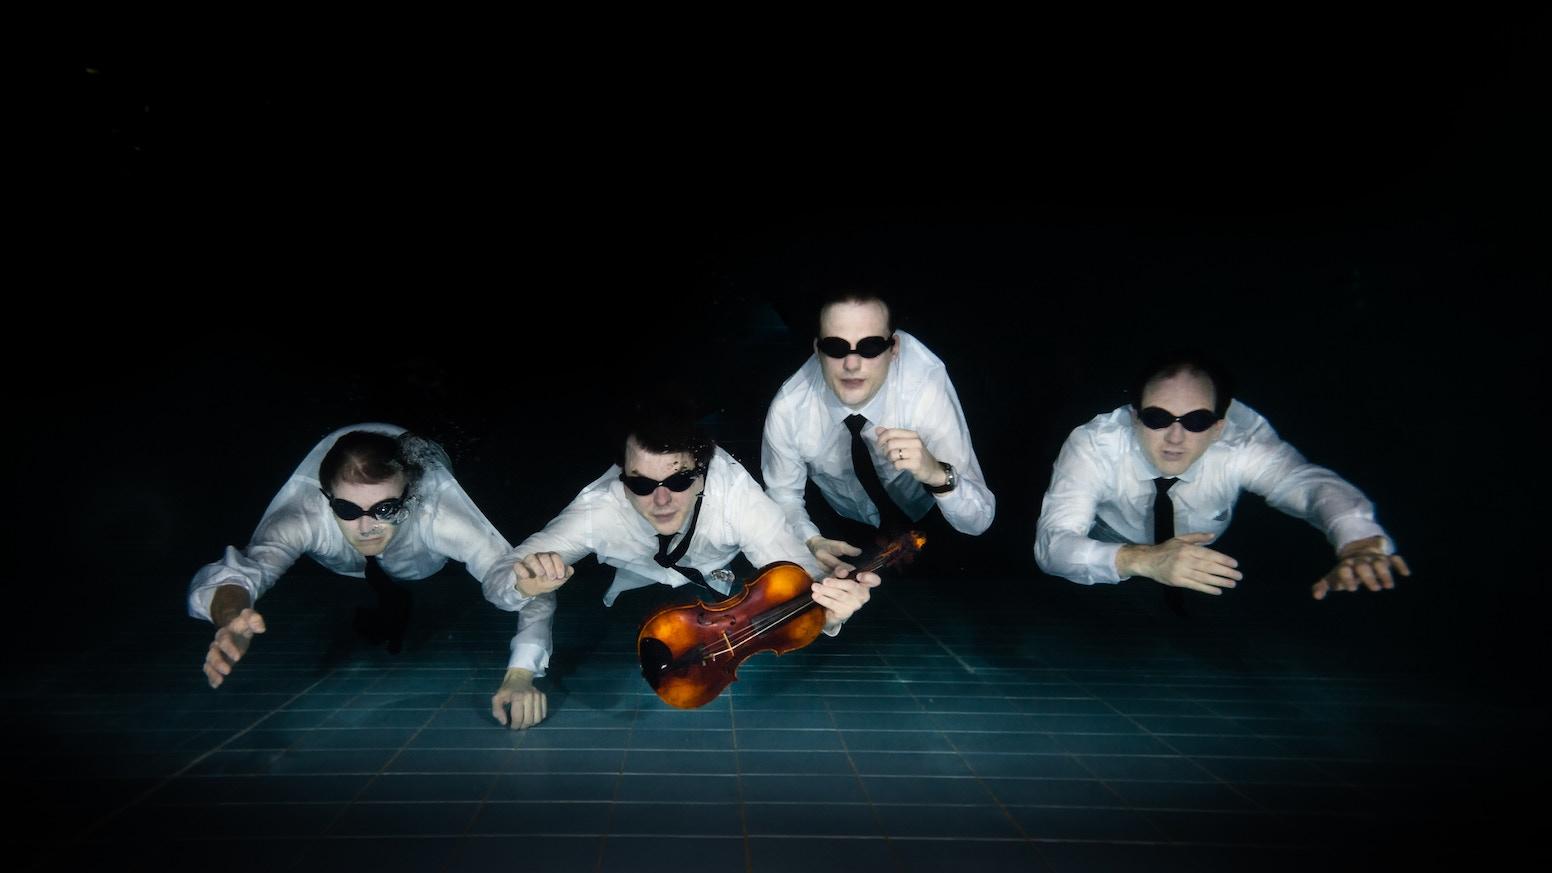 12 Seconds of Light - Modulus Quartet's debut album by